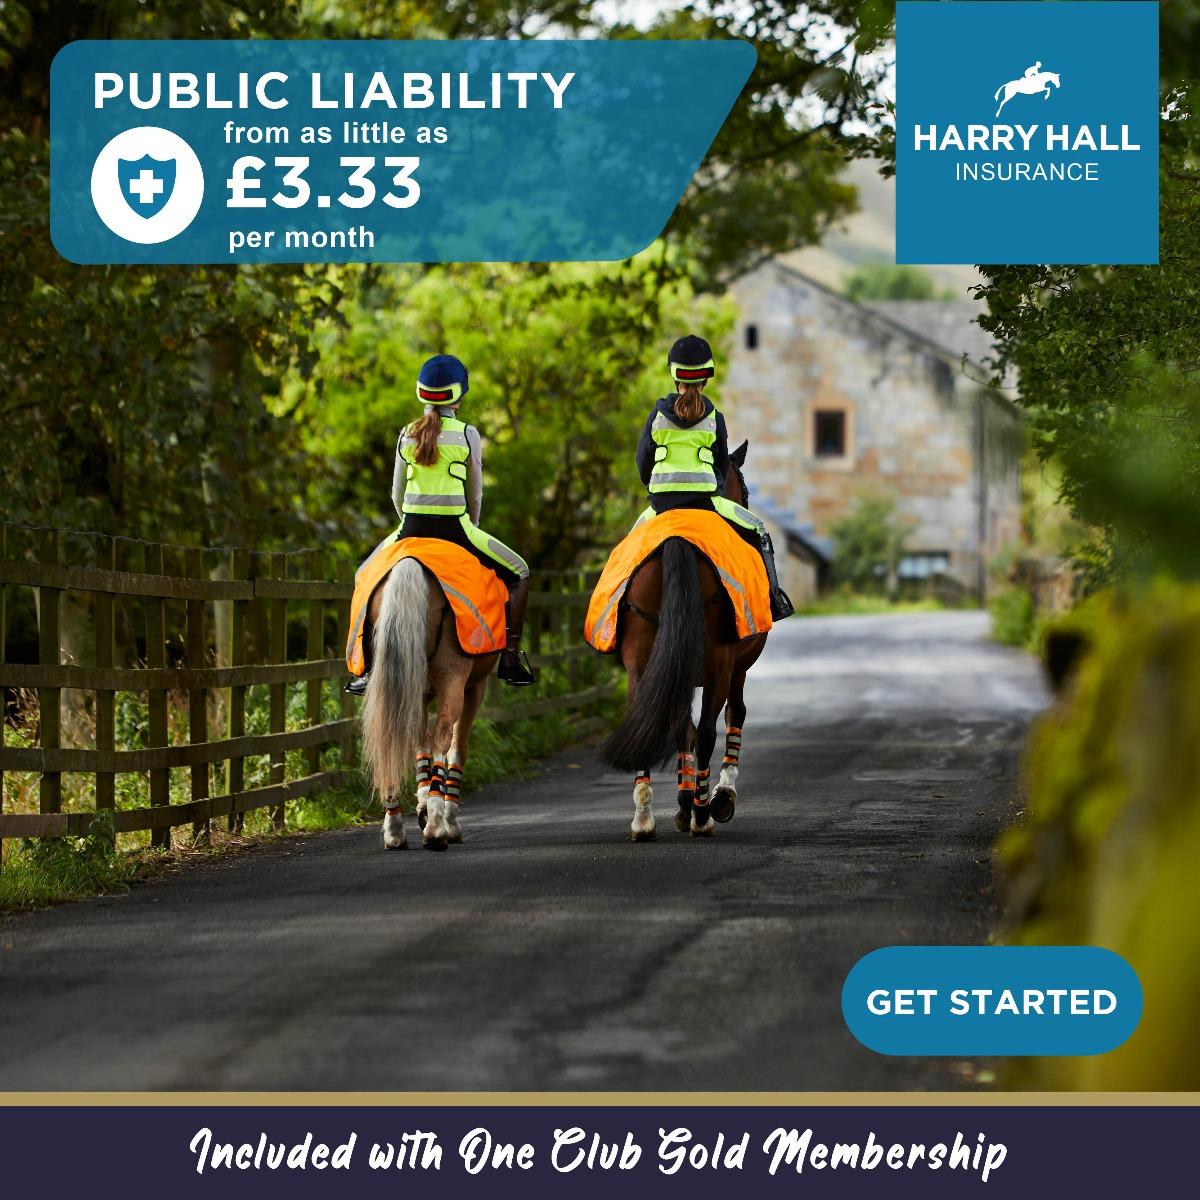 Public Liability Insurance | Harry Hall